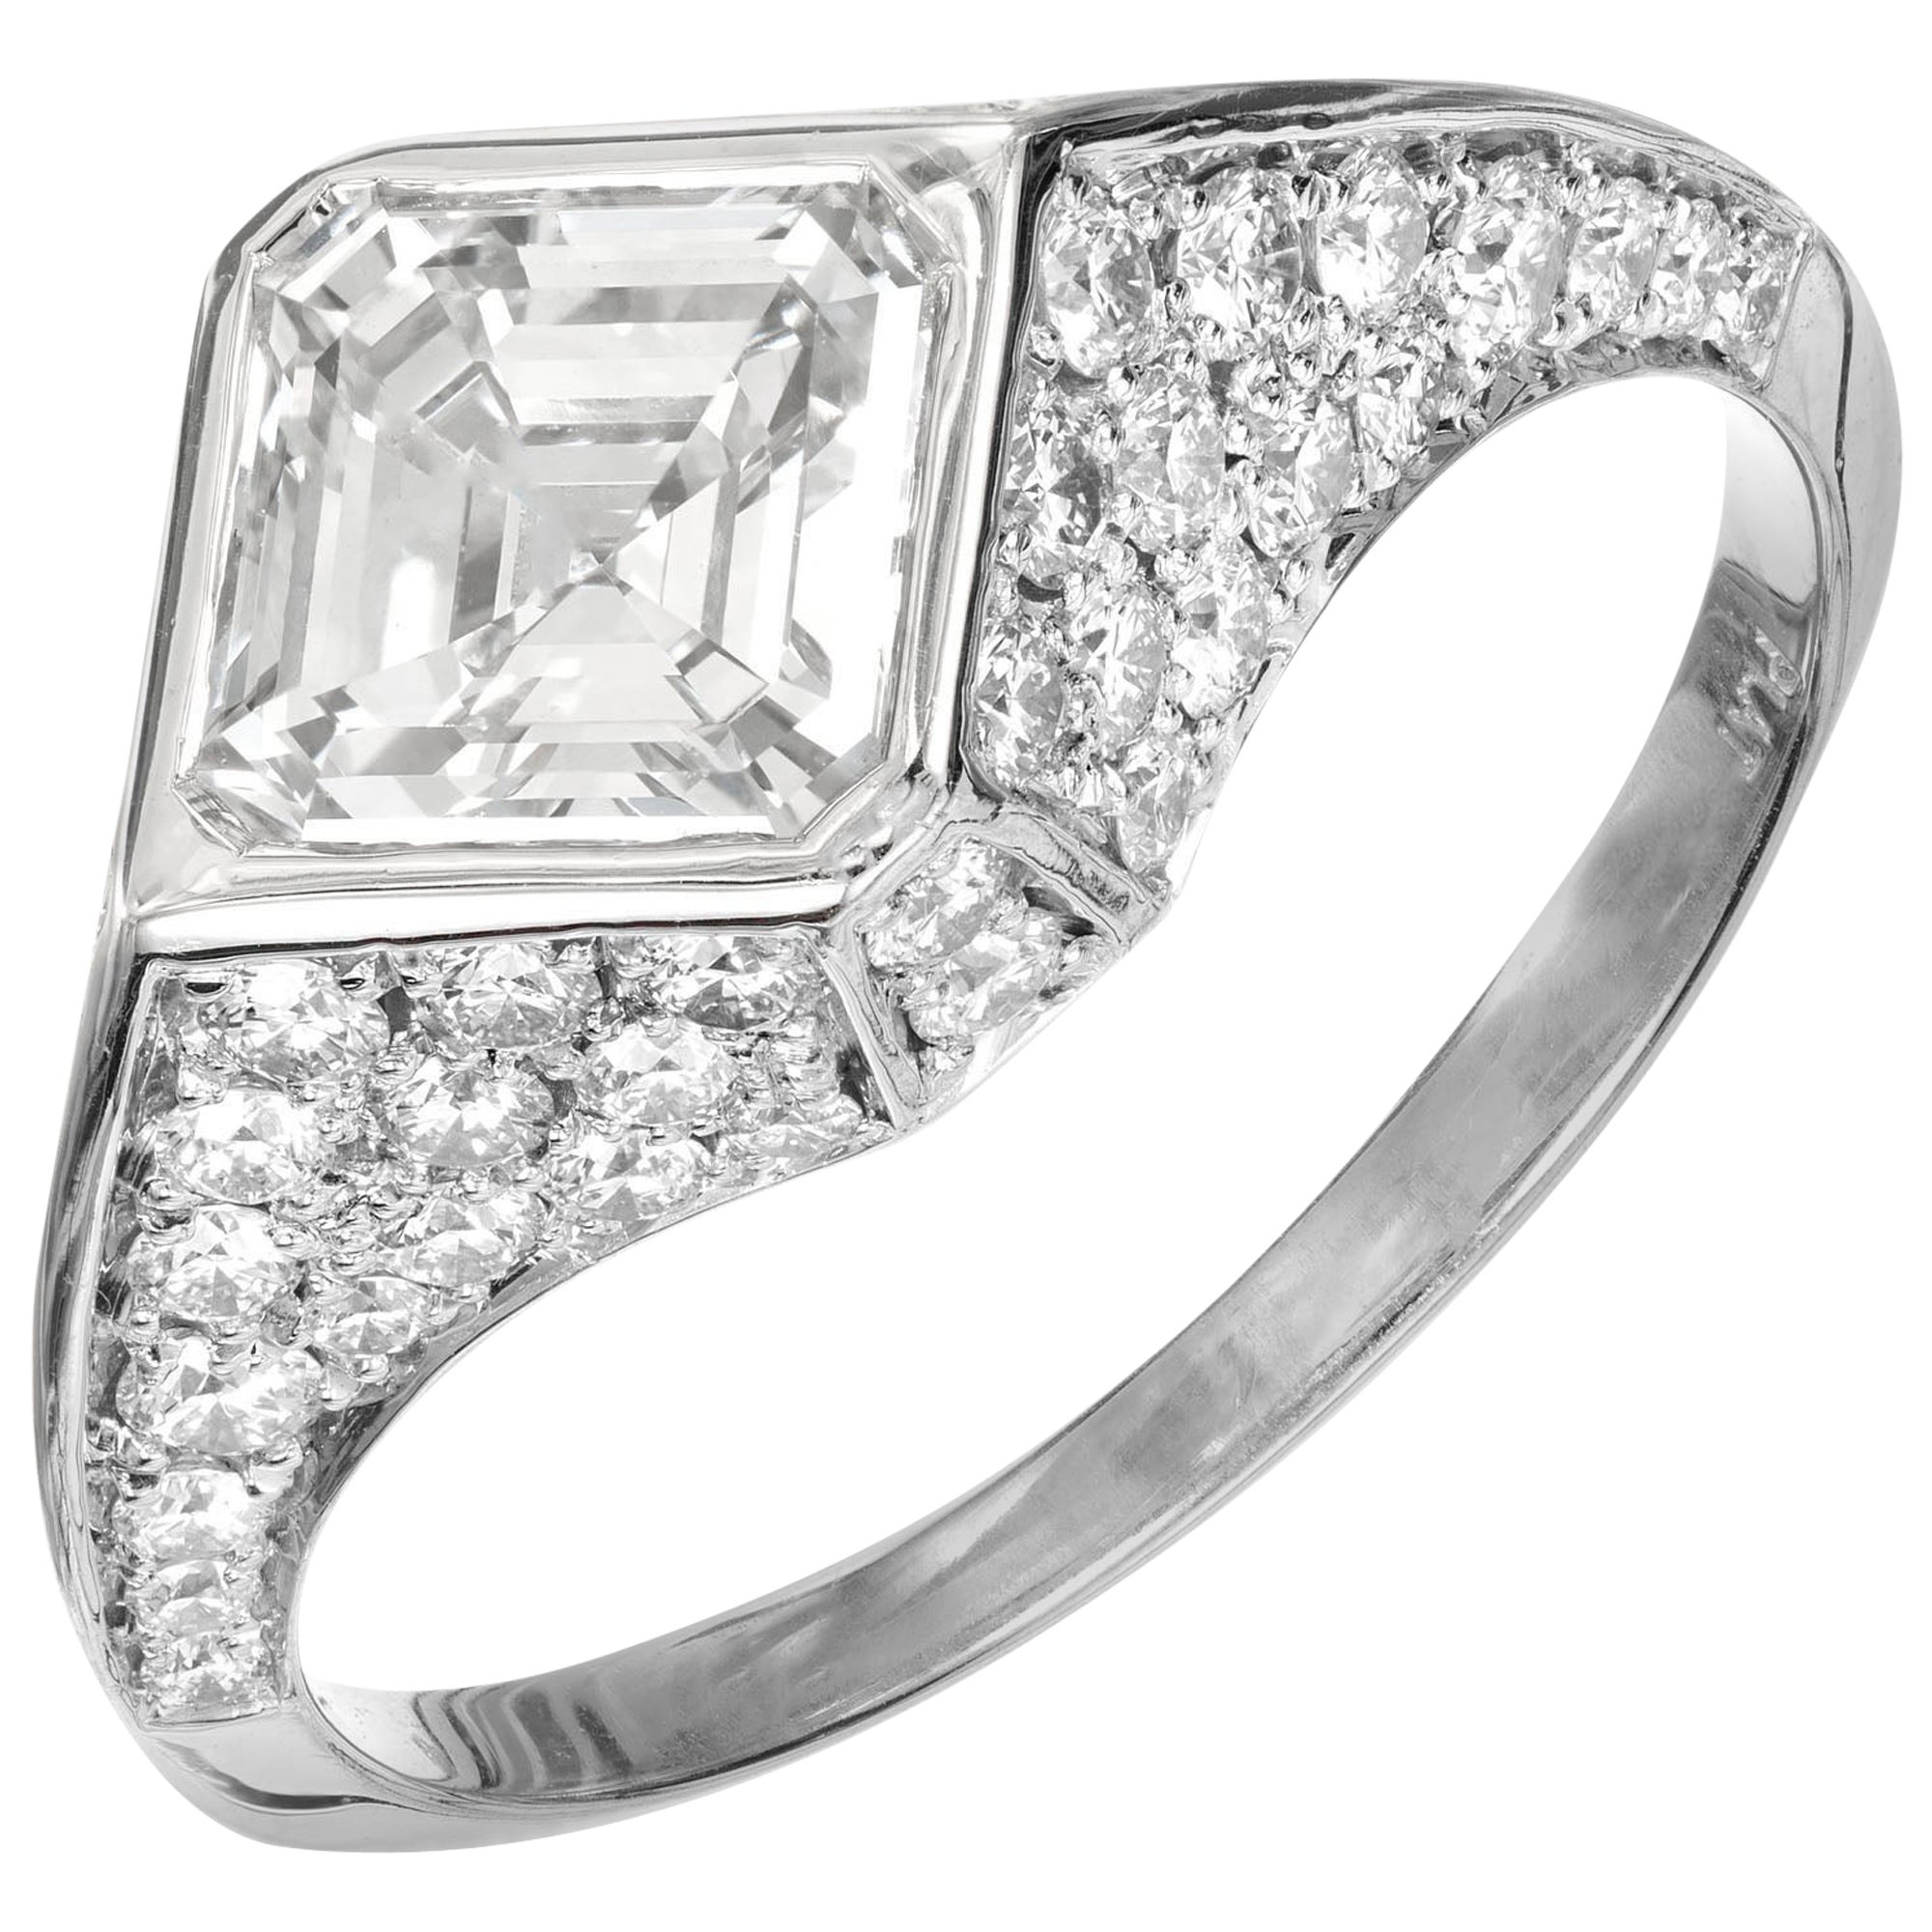 Peter Suchy GIA Certified 1.41 Carat Diamond Platinum Engagement Ring